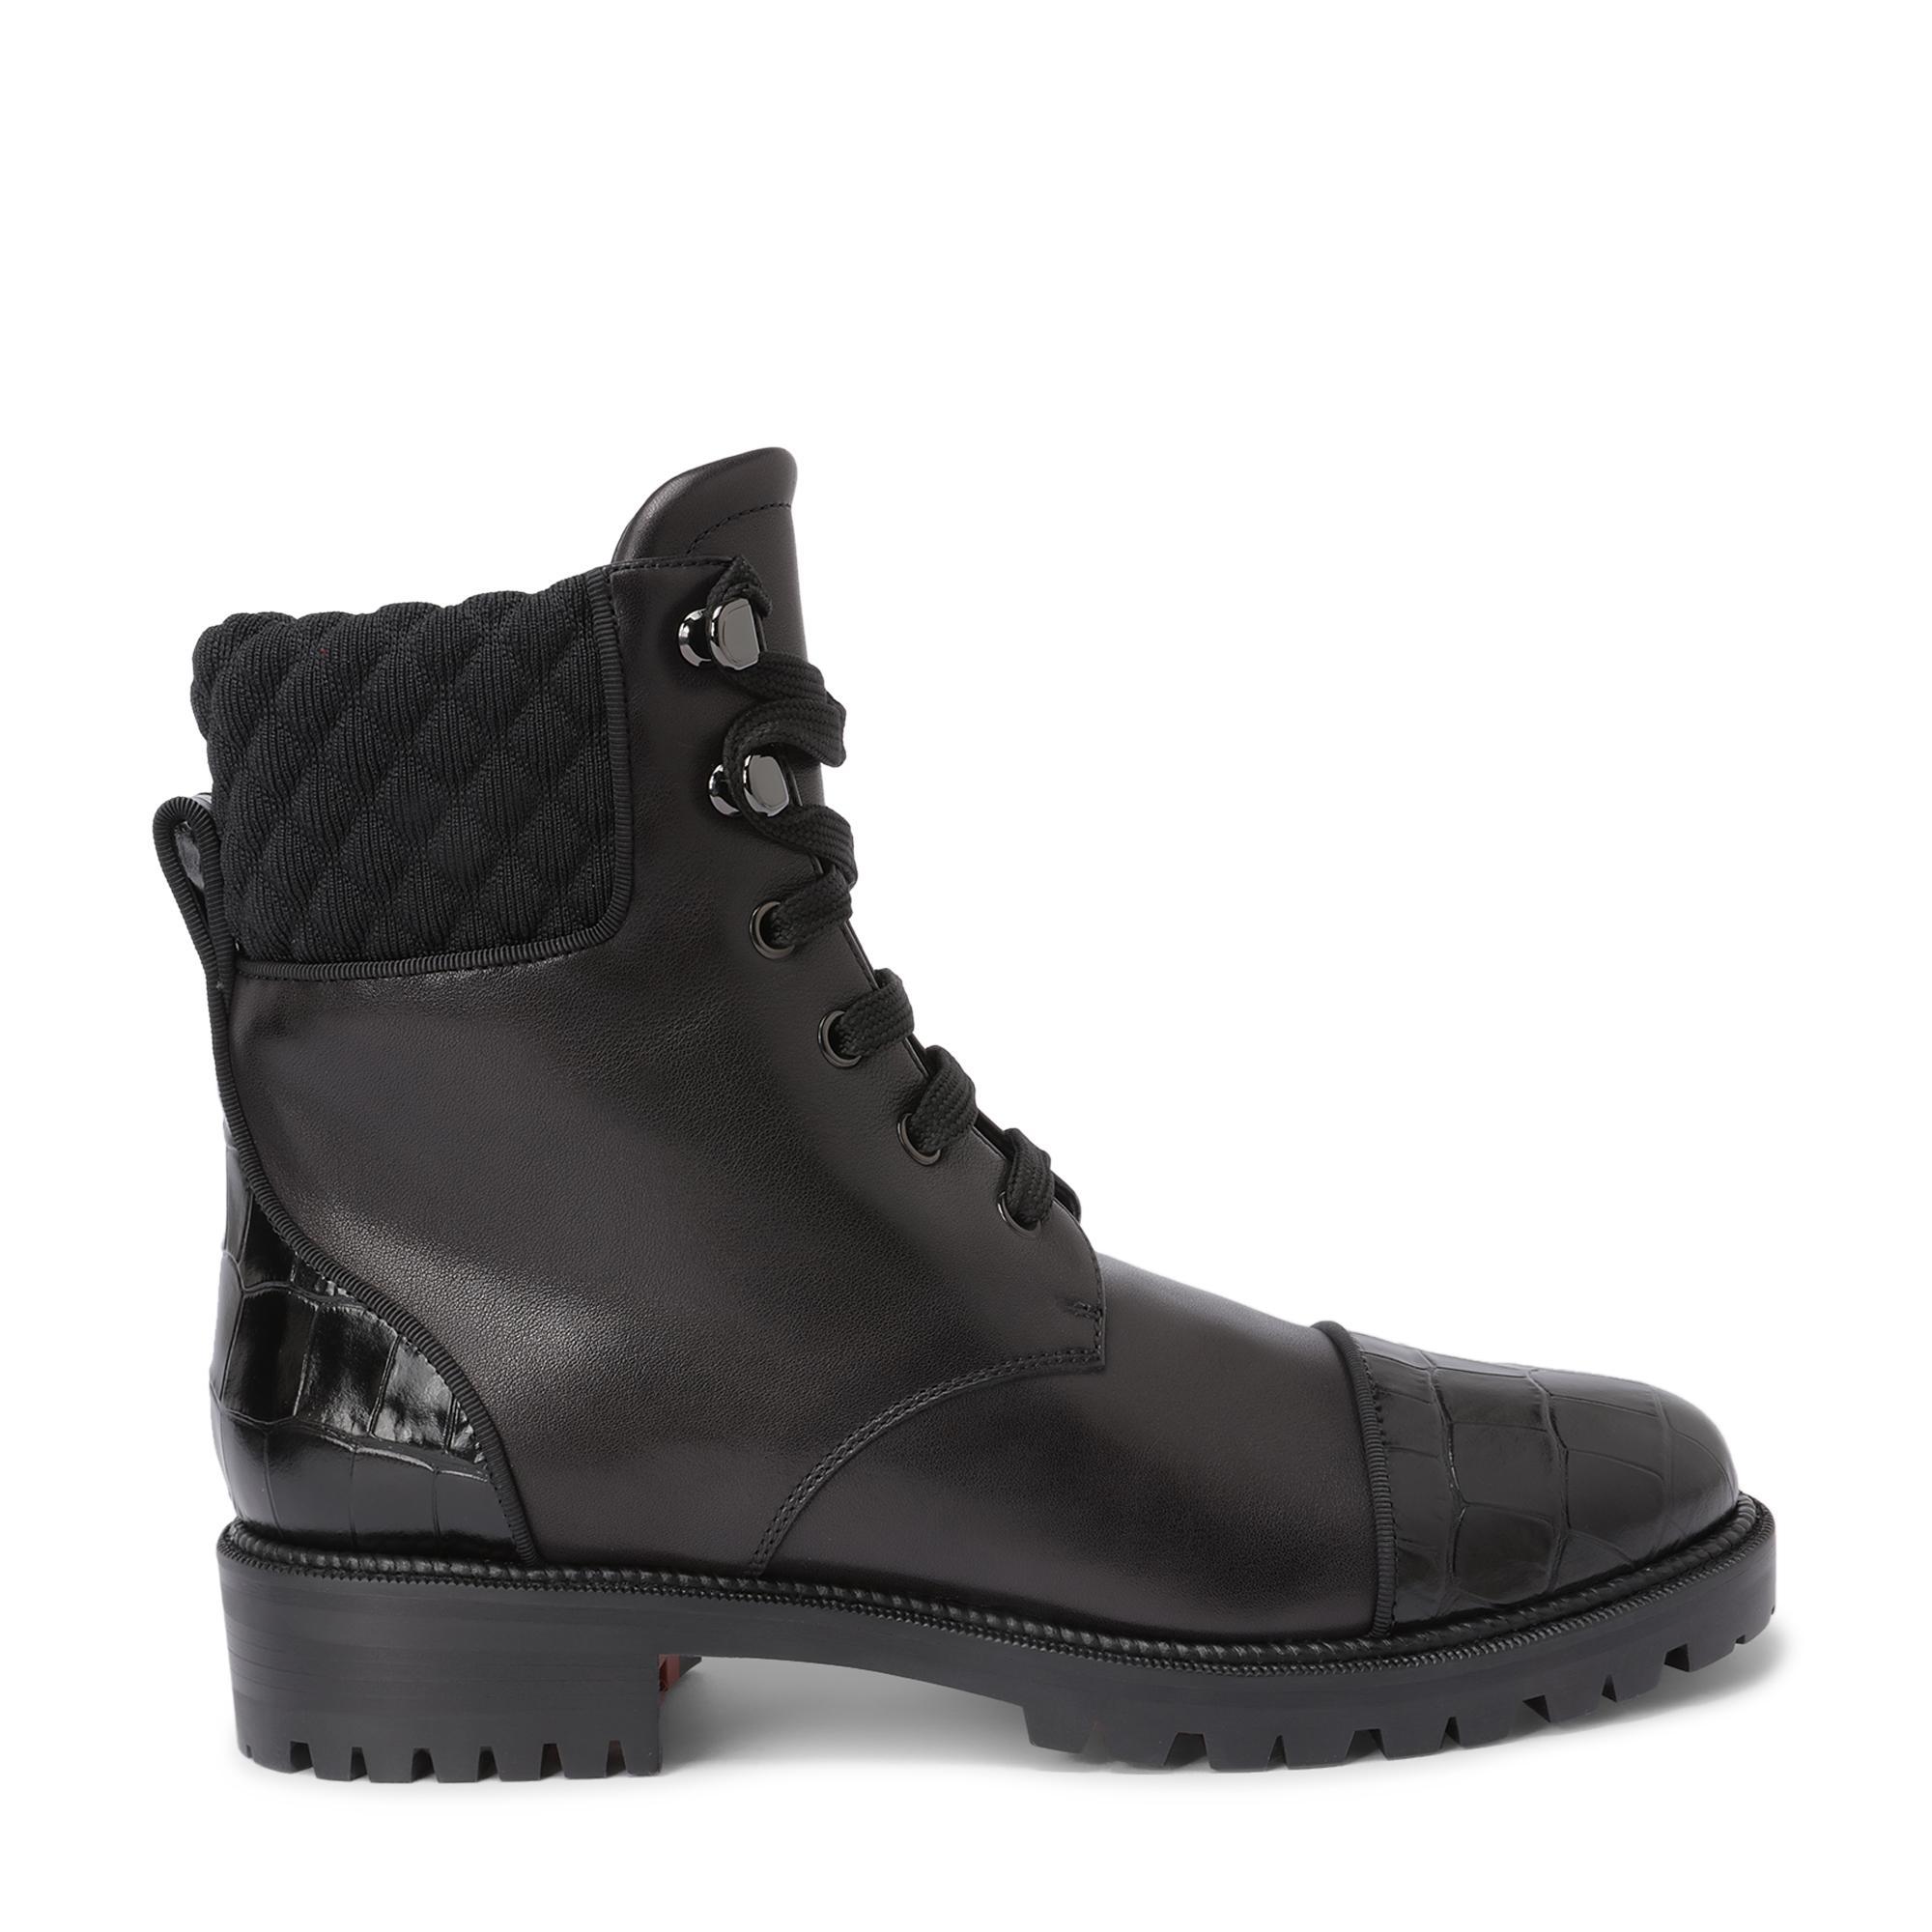 Mayr boots